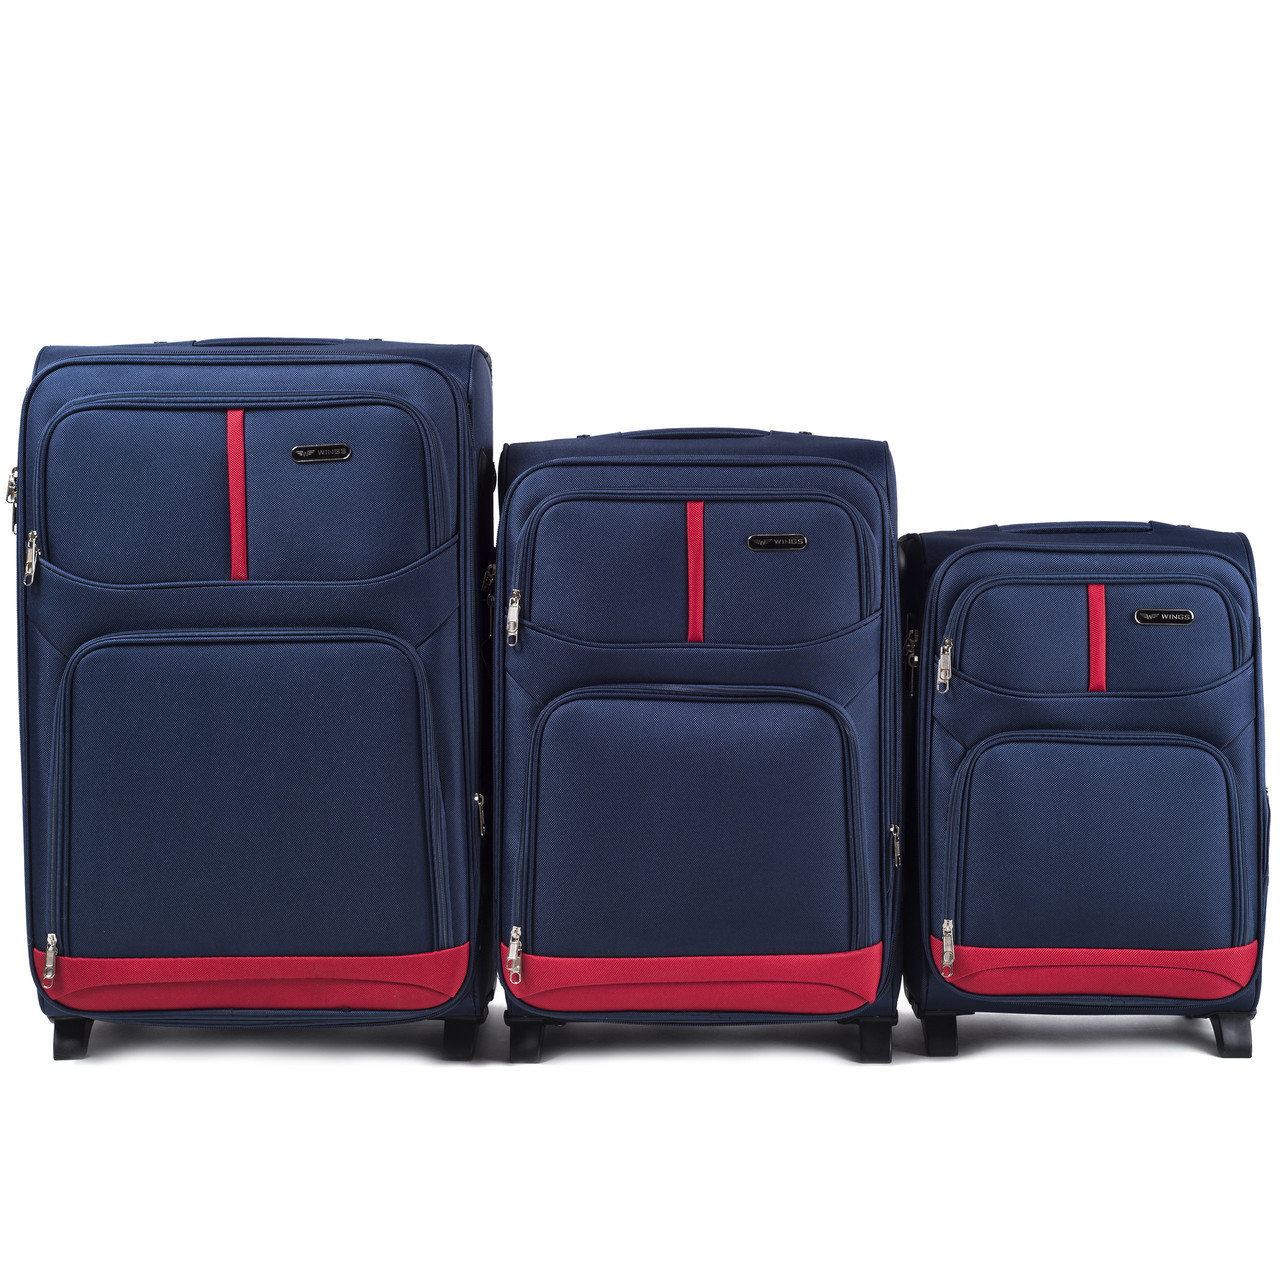 Набор чемоданов 3 штуки в 1 Wings 206 на 2 колесах Синий